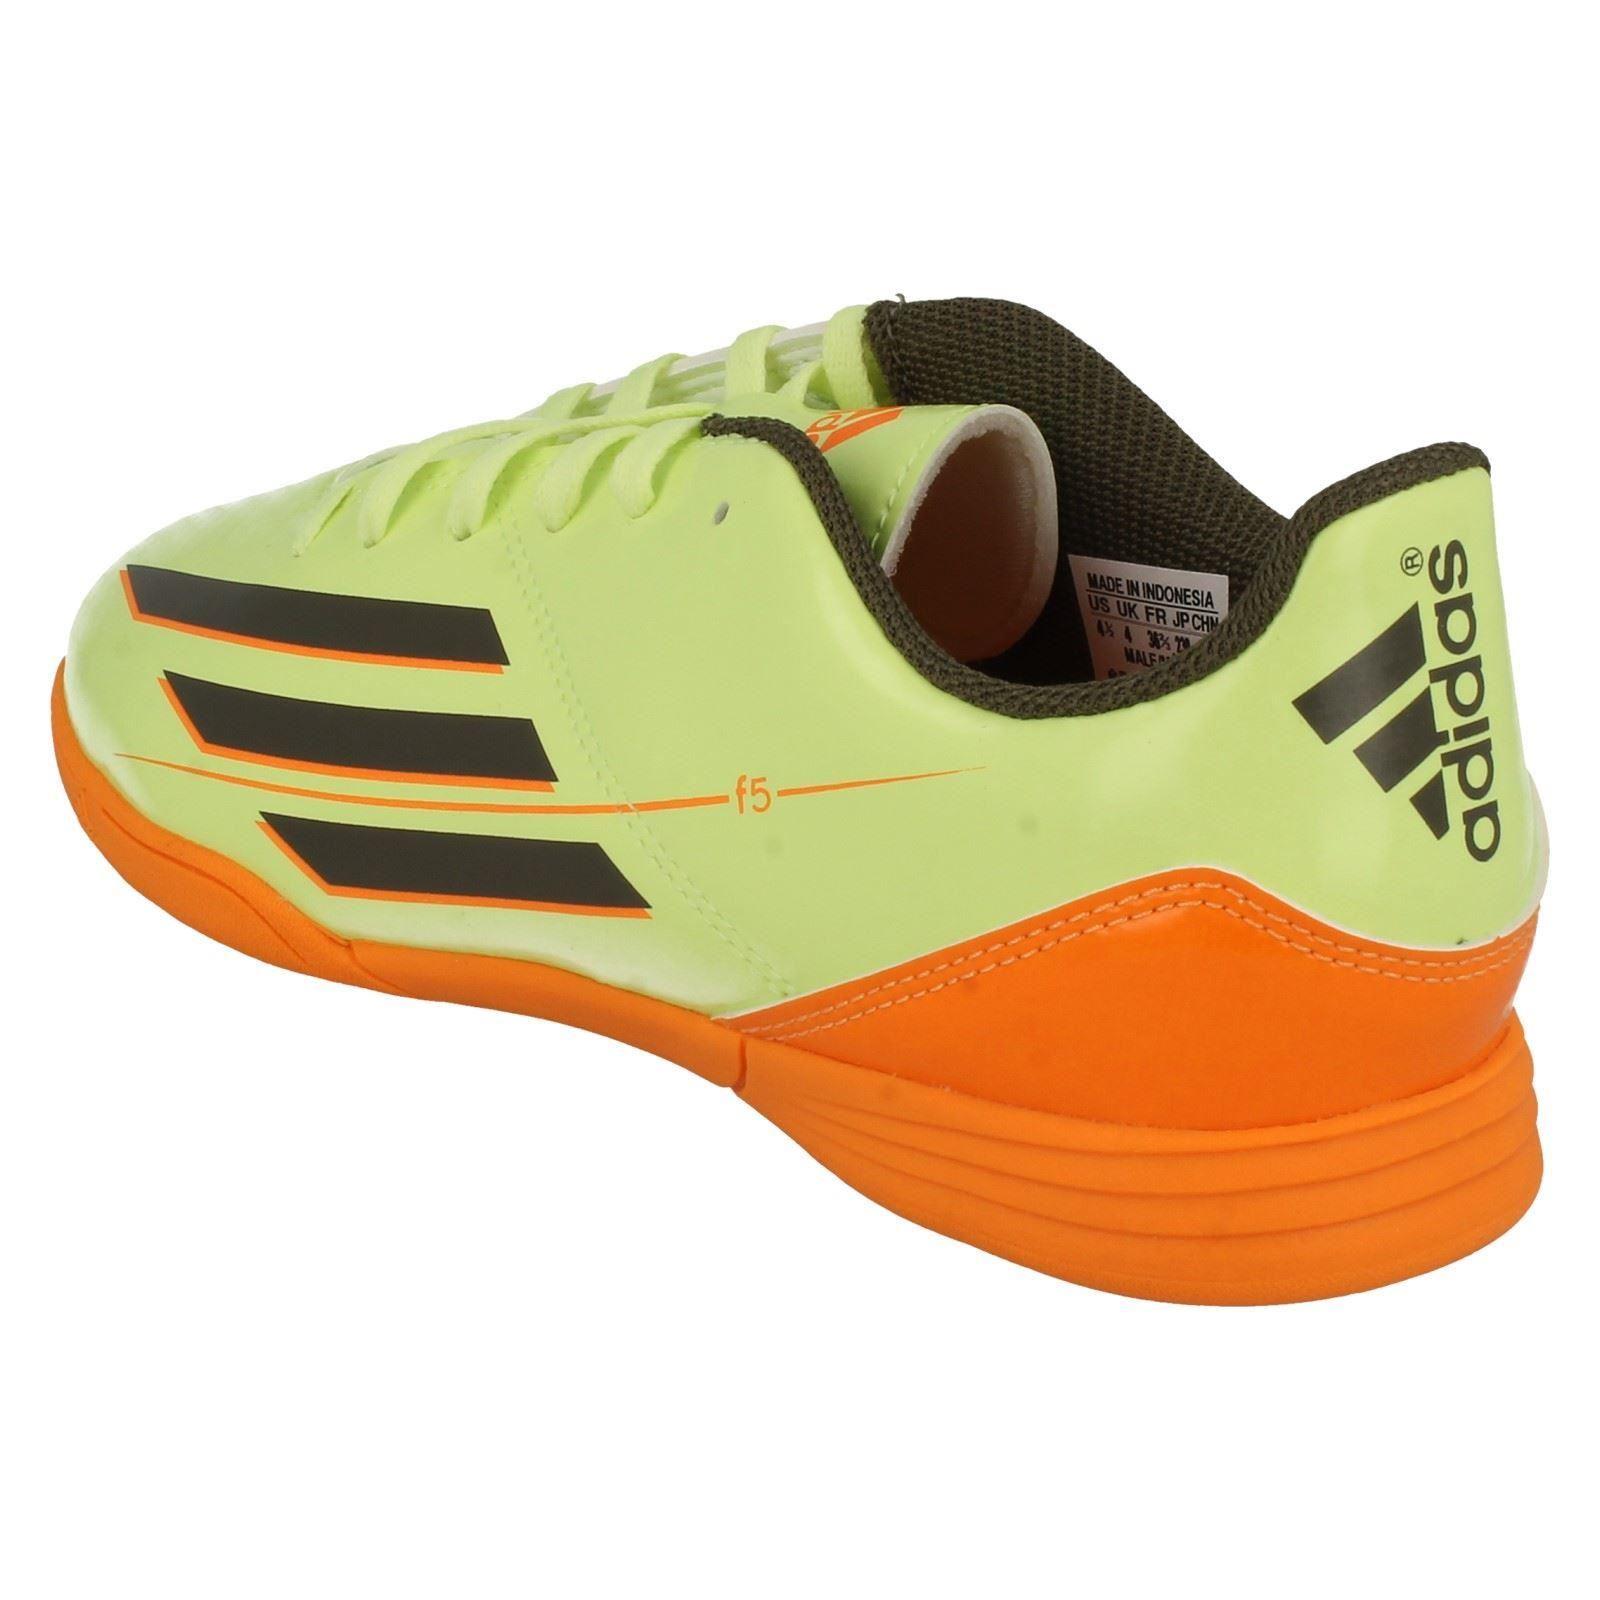 Adidas Boys Football Trainers - F5 IN J